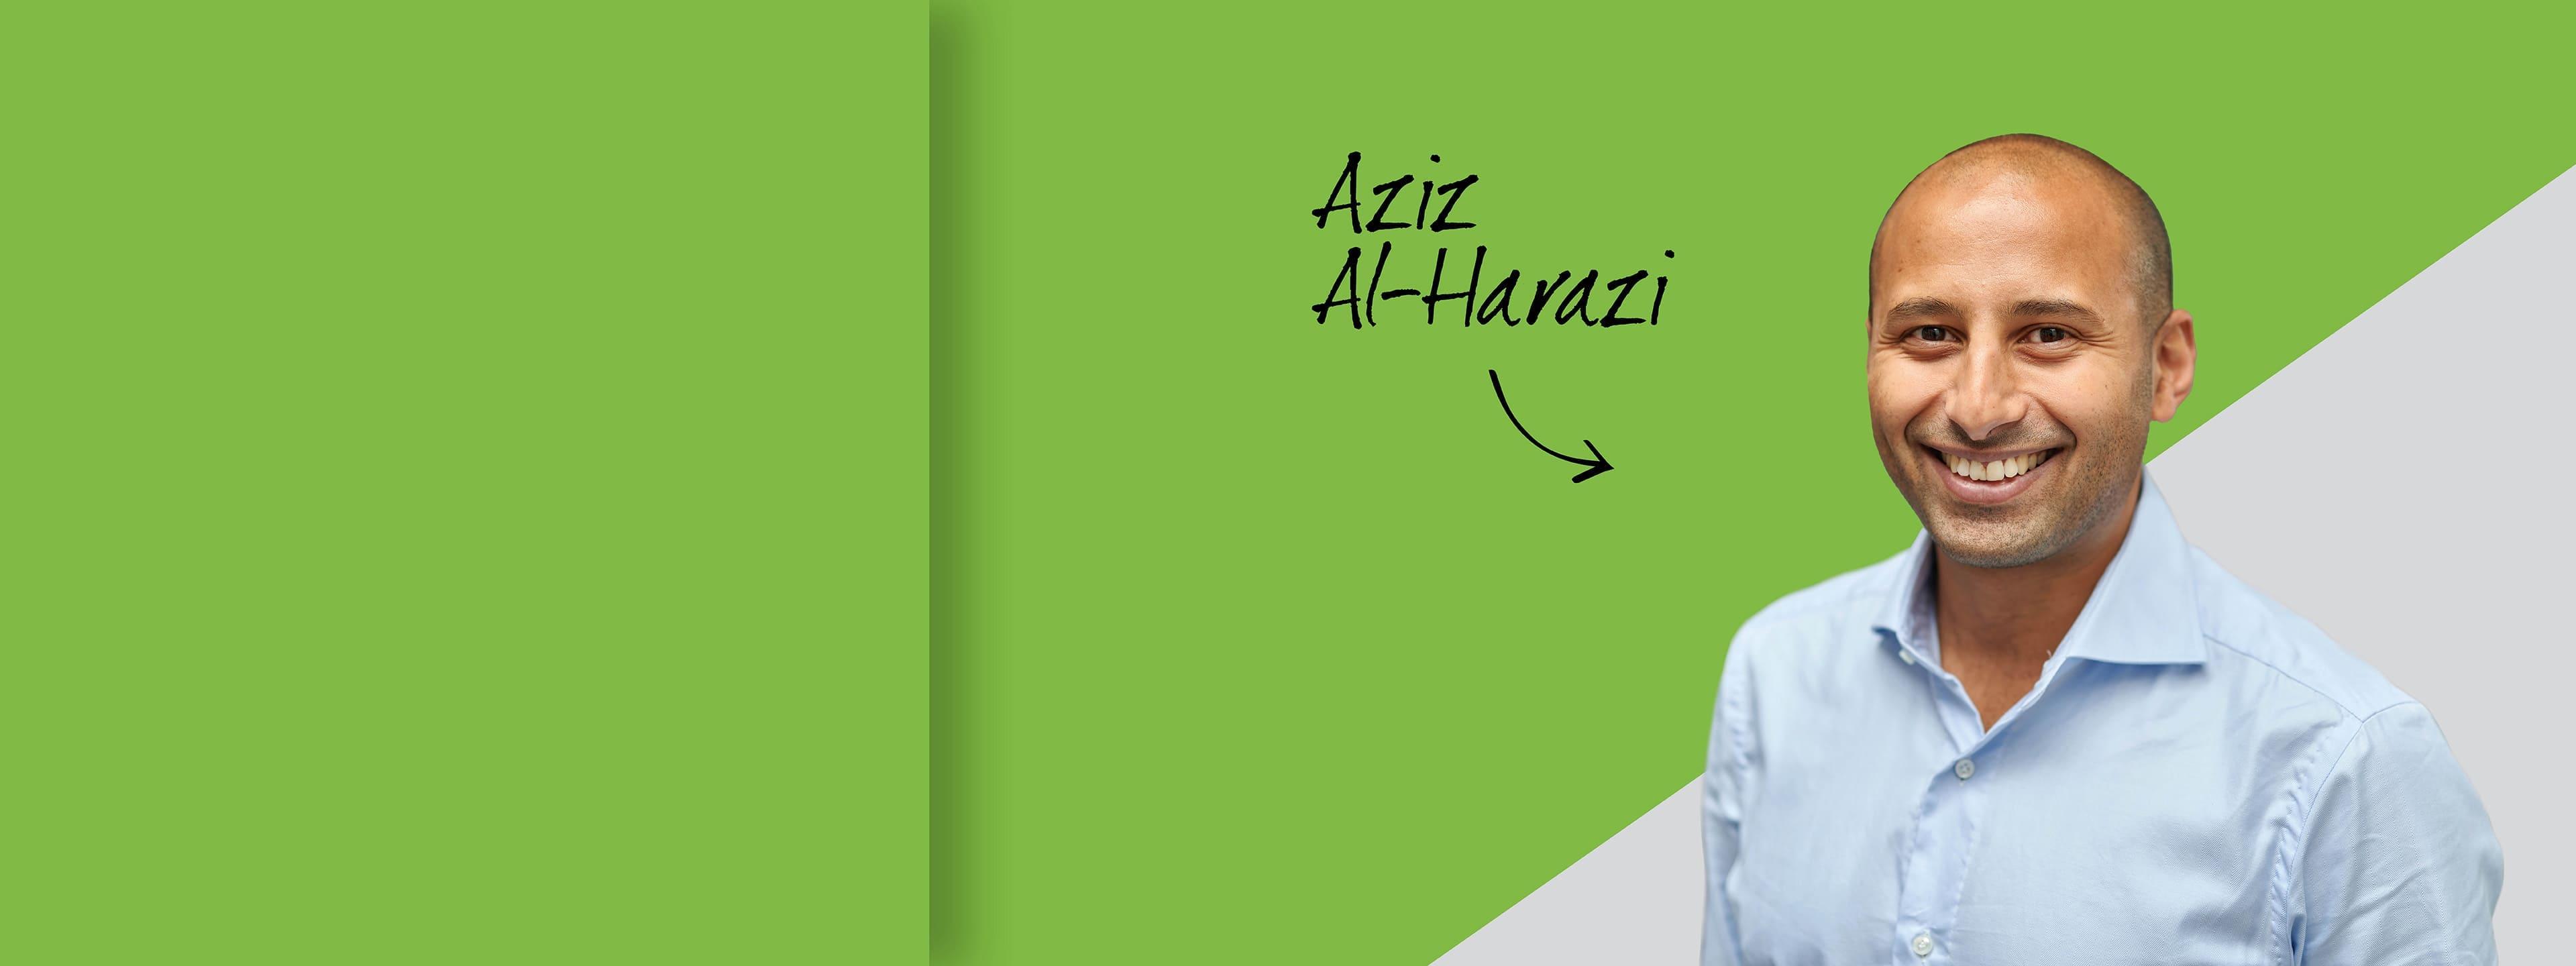 Aziz Al-Harazi, Payt vertelt over koppeling Twinfield